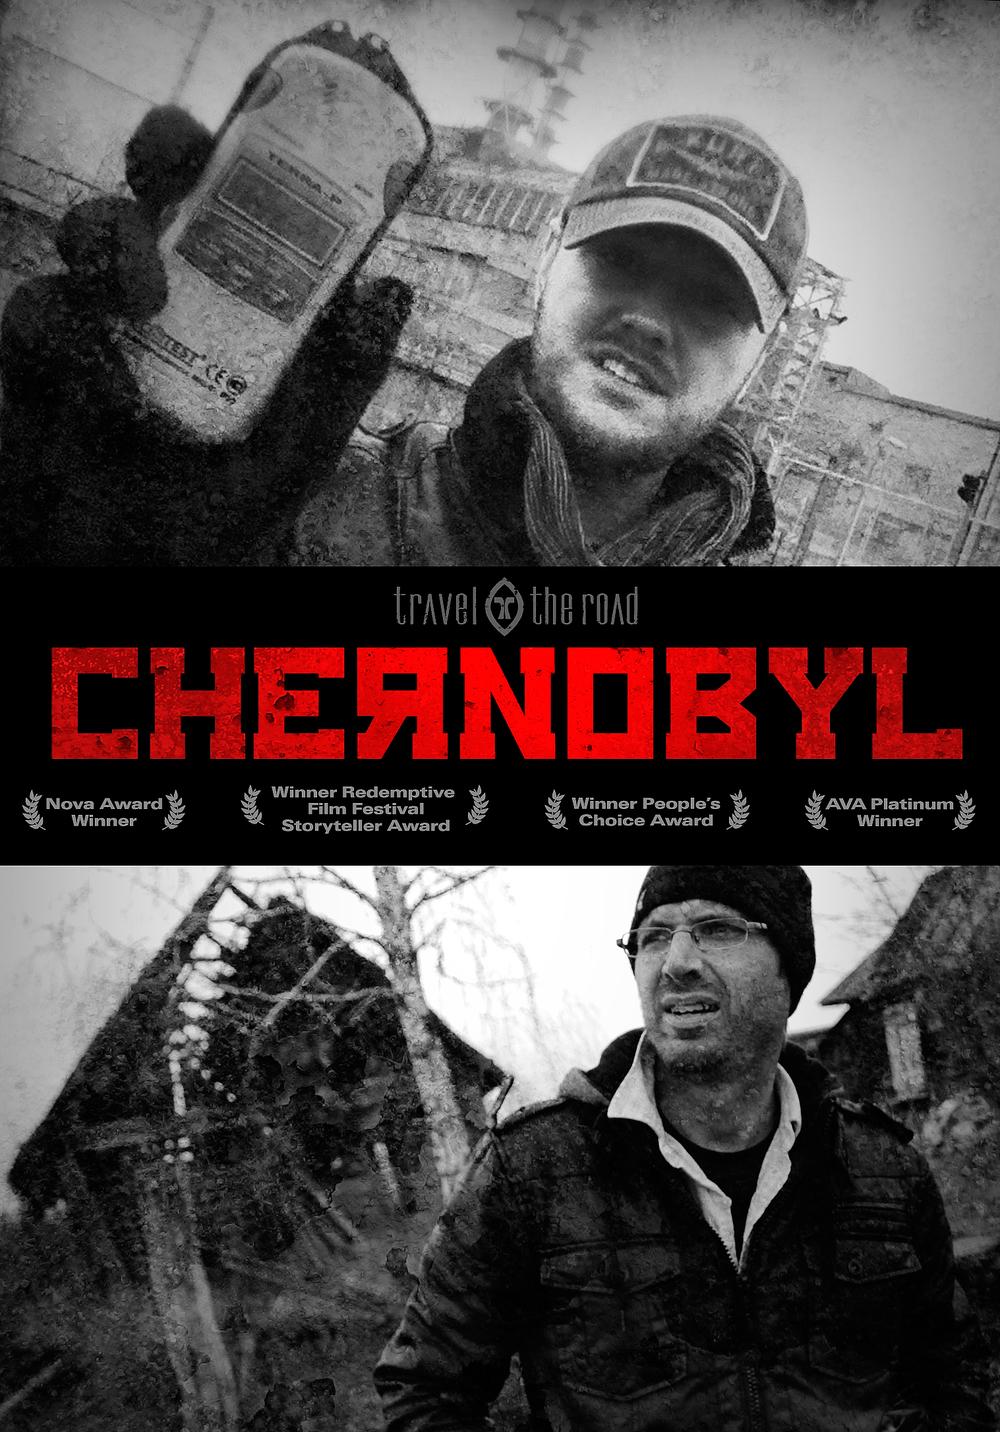 ttr chernobyl image v2 hi res .jpg